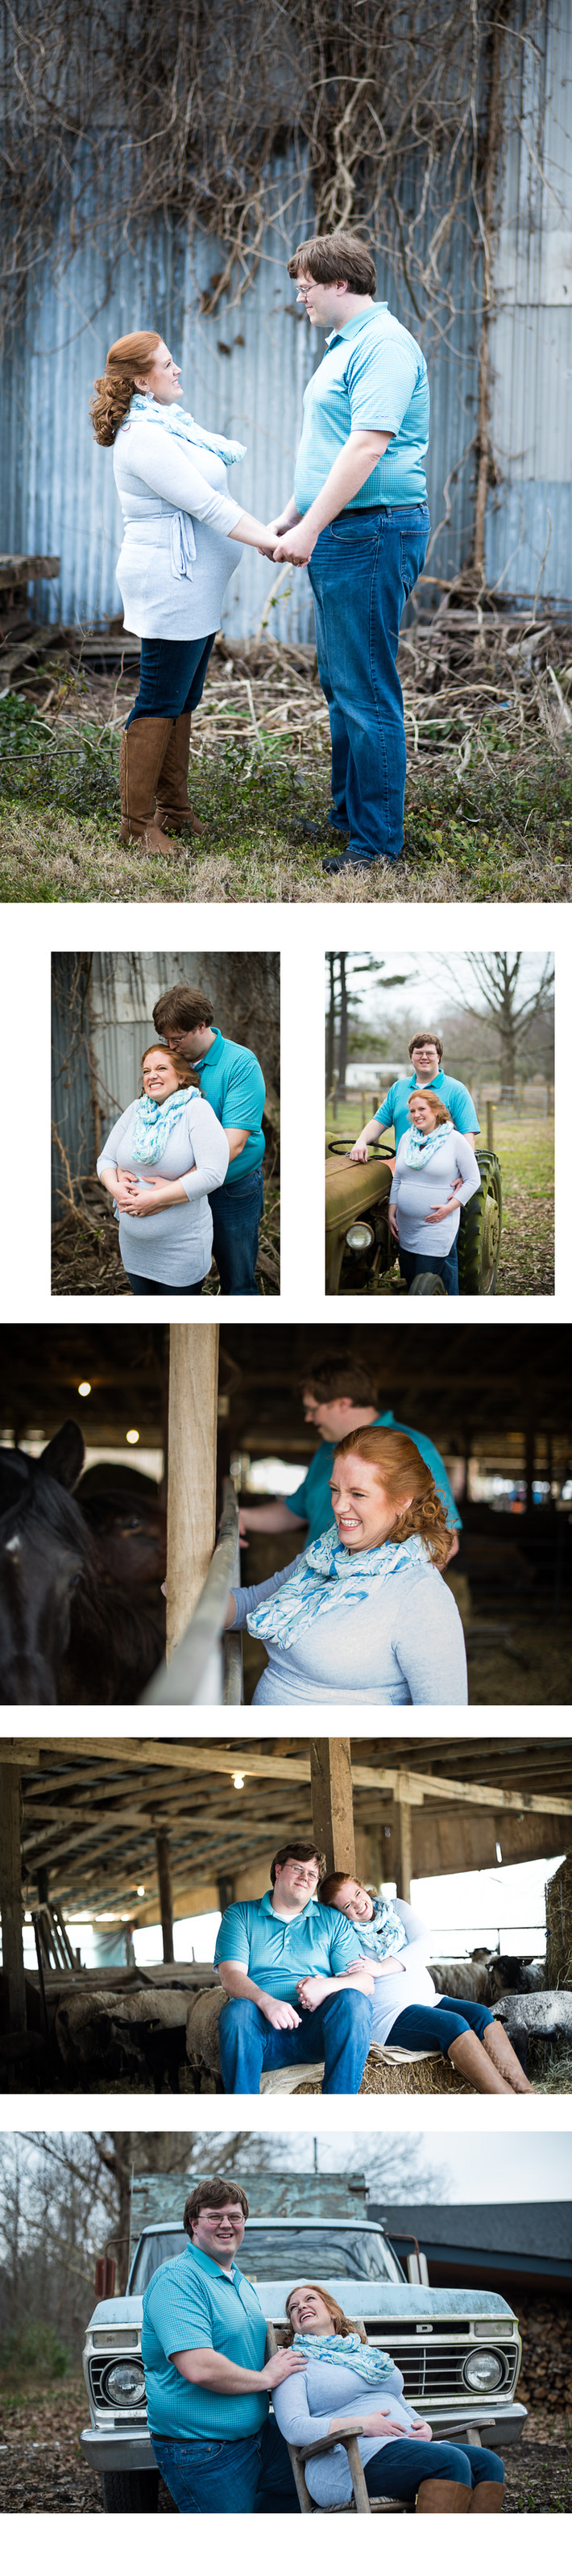 Hannah and Justin's Rustic Farm Outdoor Maternity Shoot